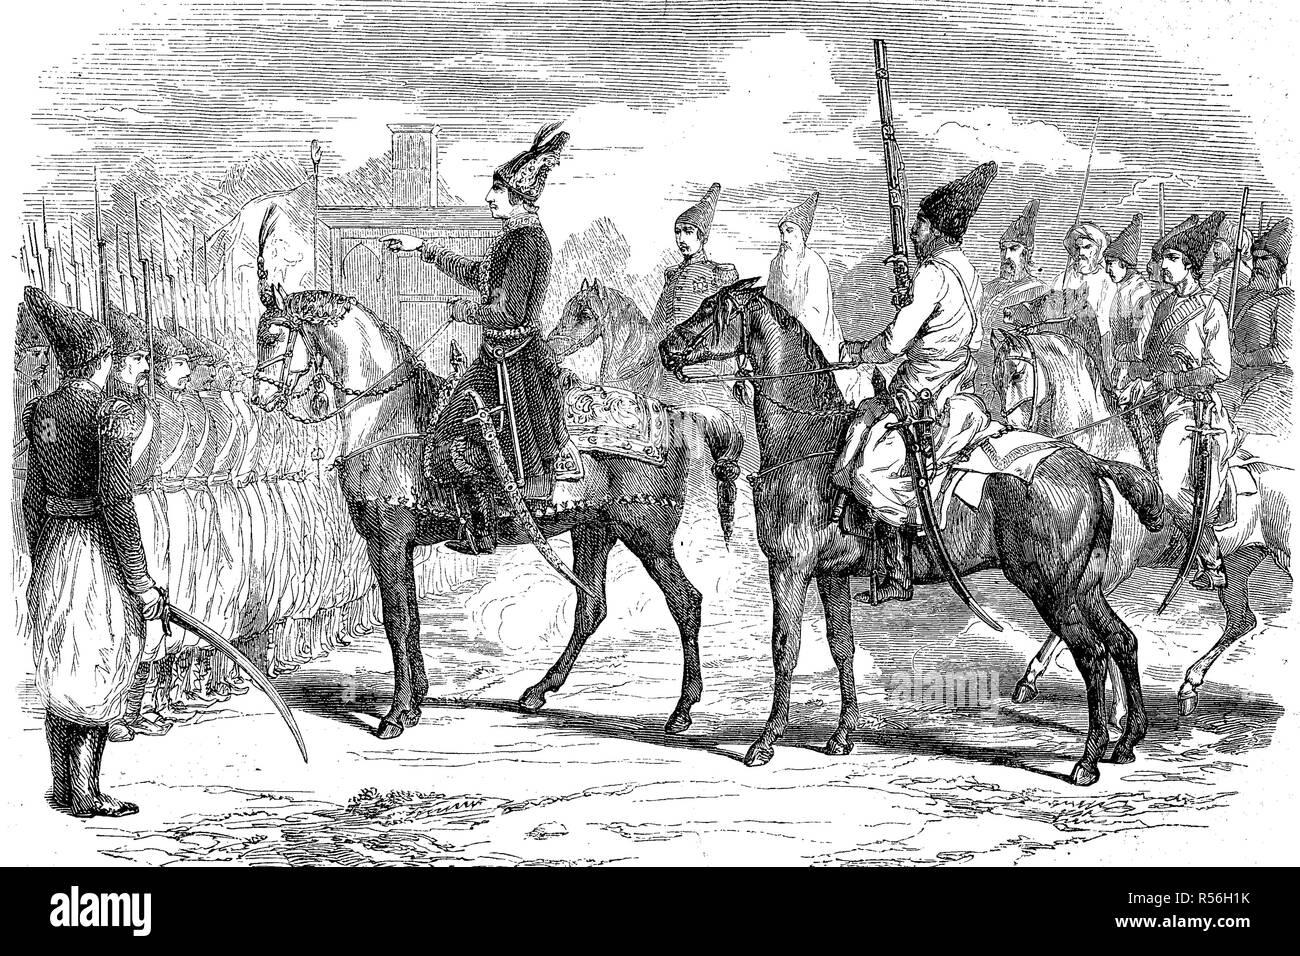 Crimean War, Naser al-Din Shah Qajar, 1831- 1896, also Nassereddin Shah Qajar, King of Persia, woodcut, Iran - Stock Image